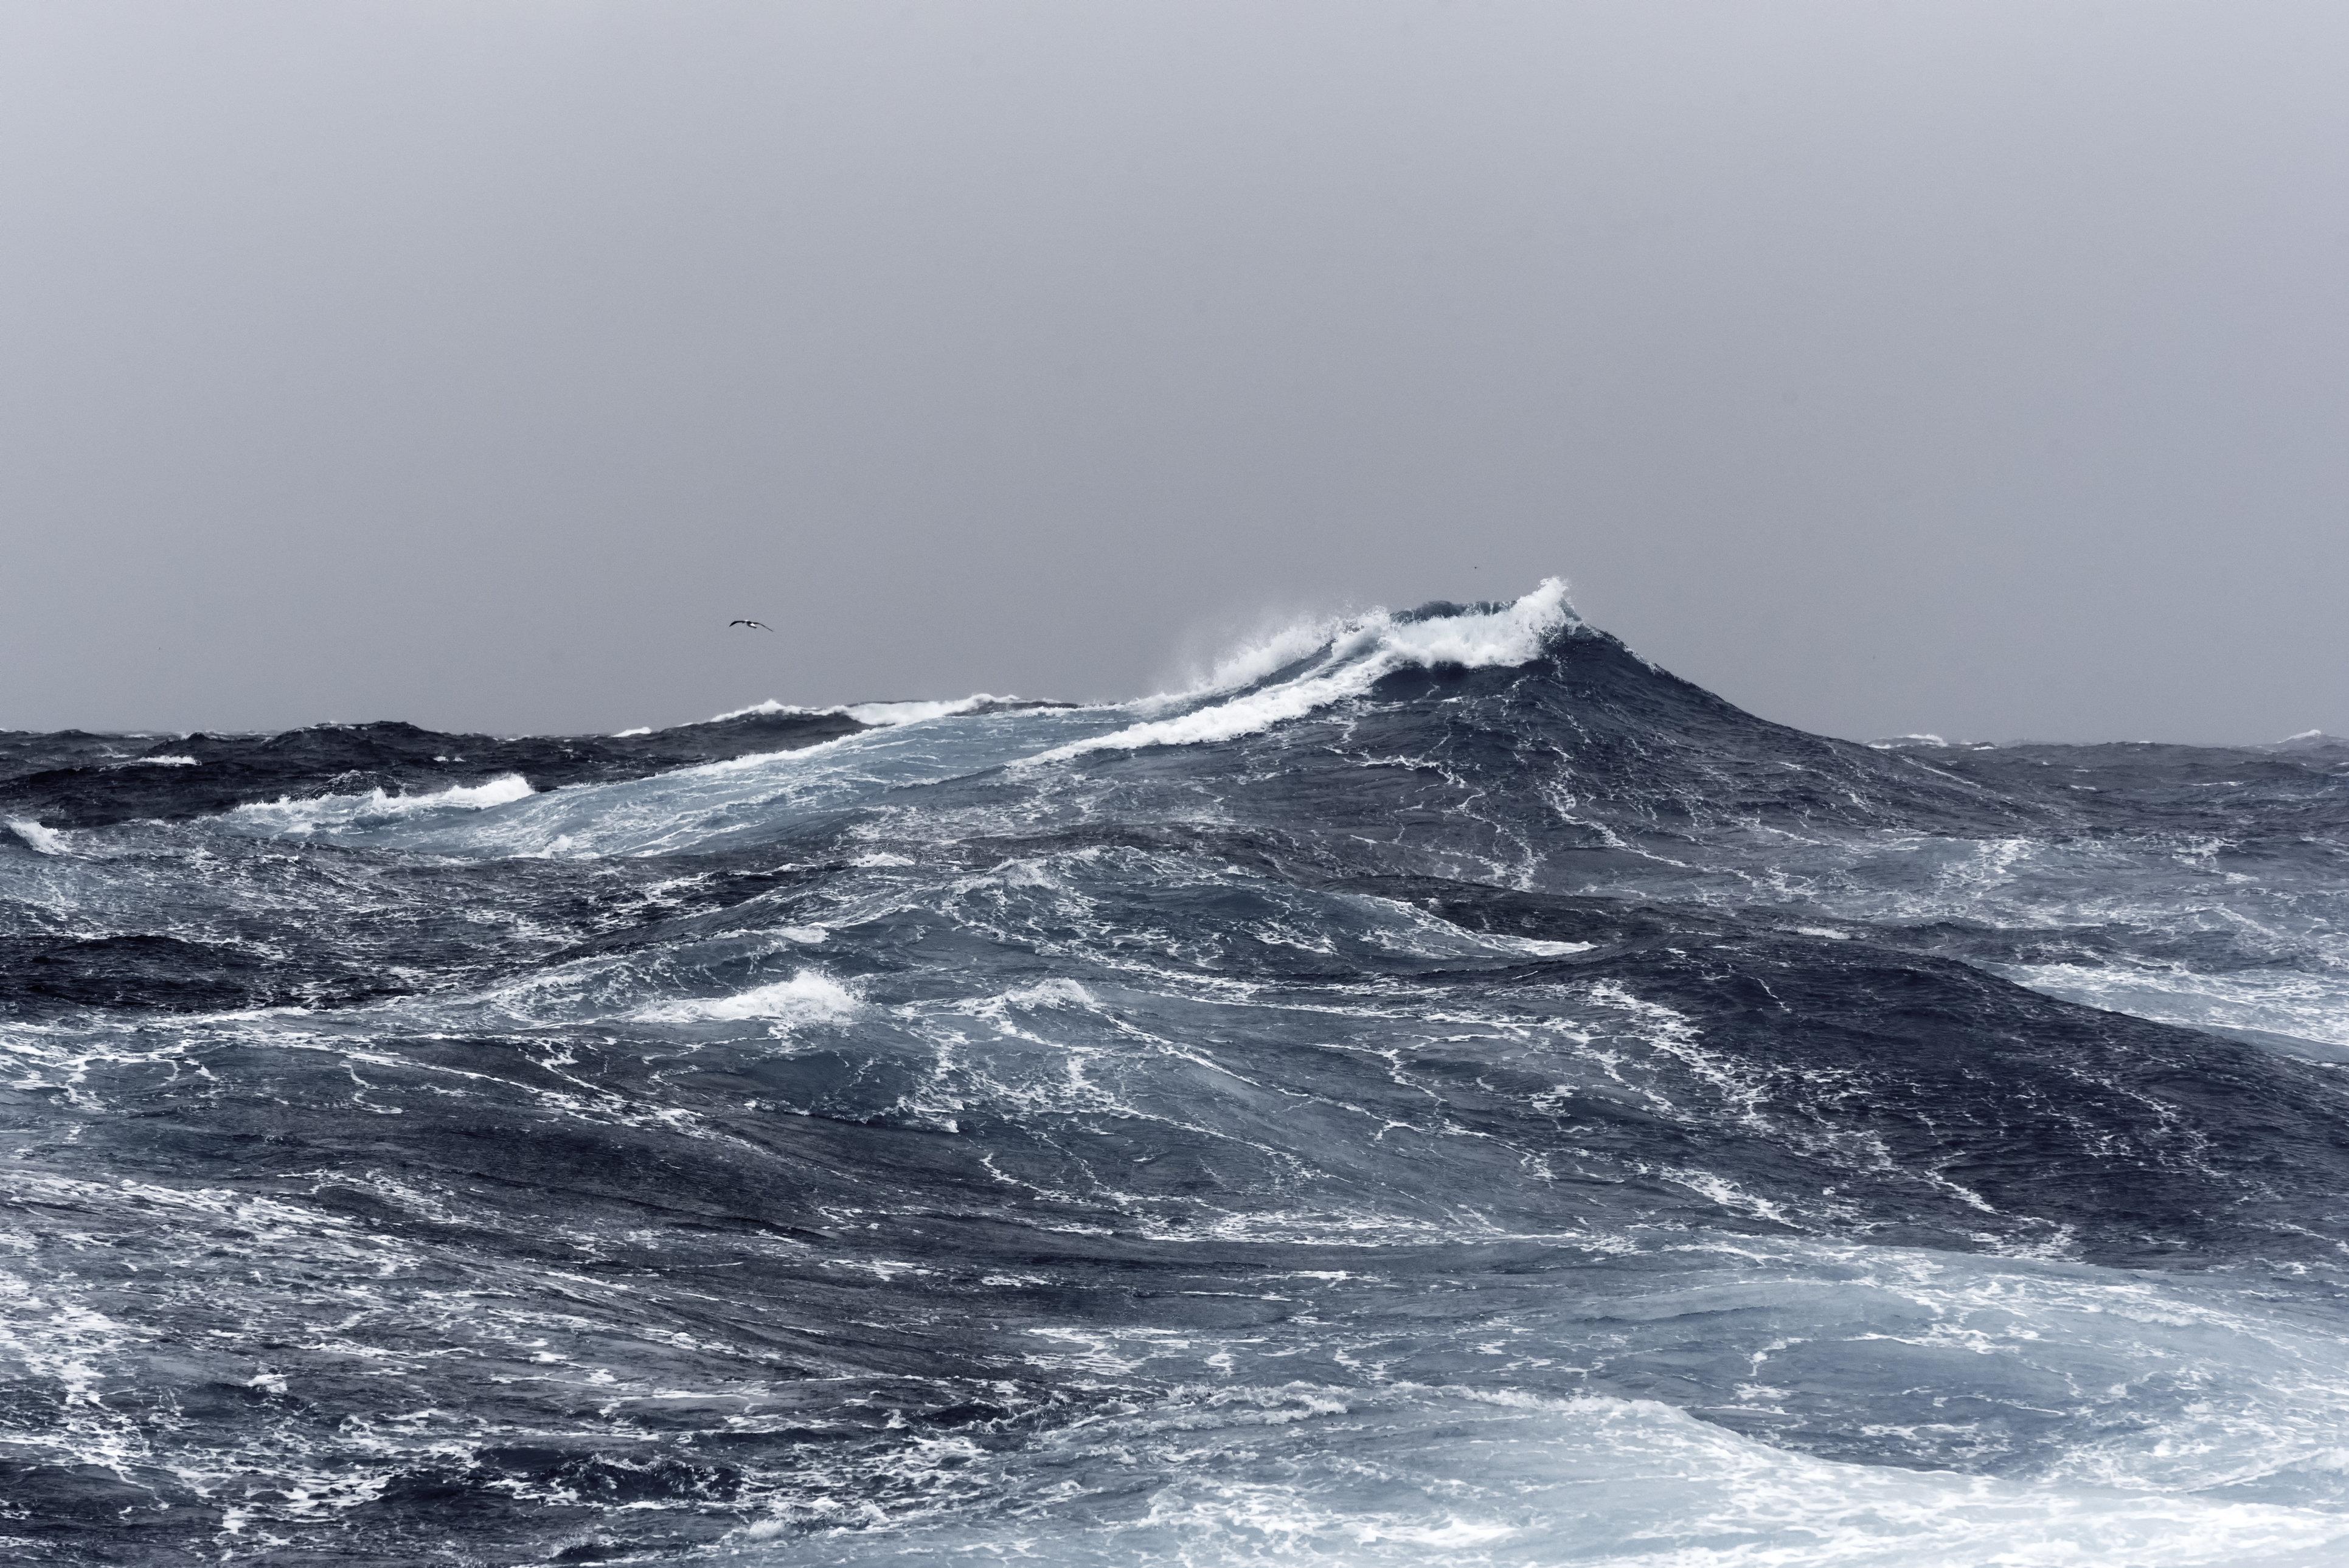 Big ocean swells in open water of the Southern Ocean